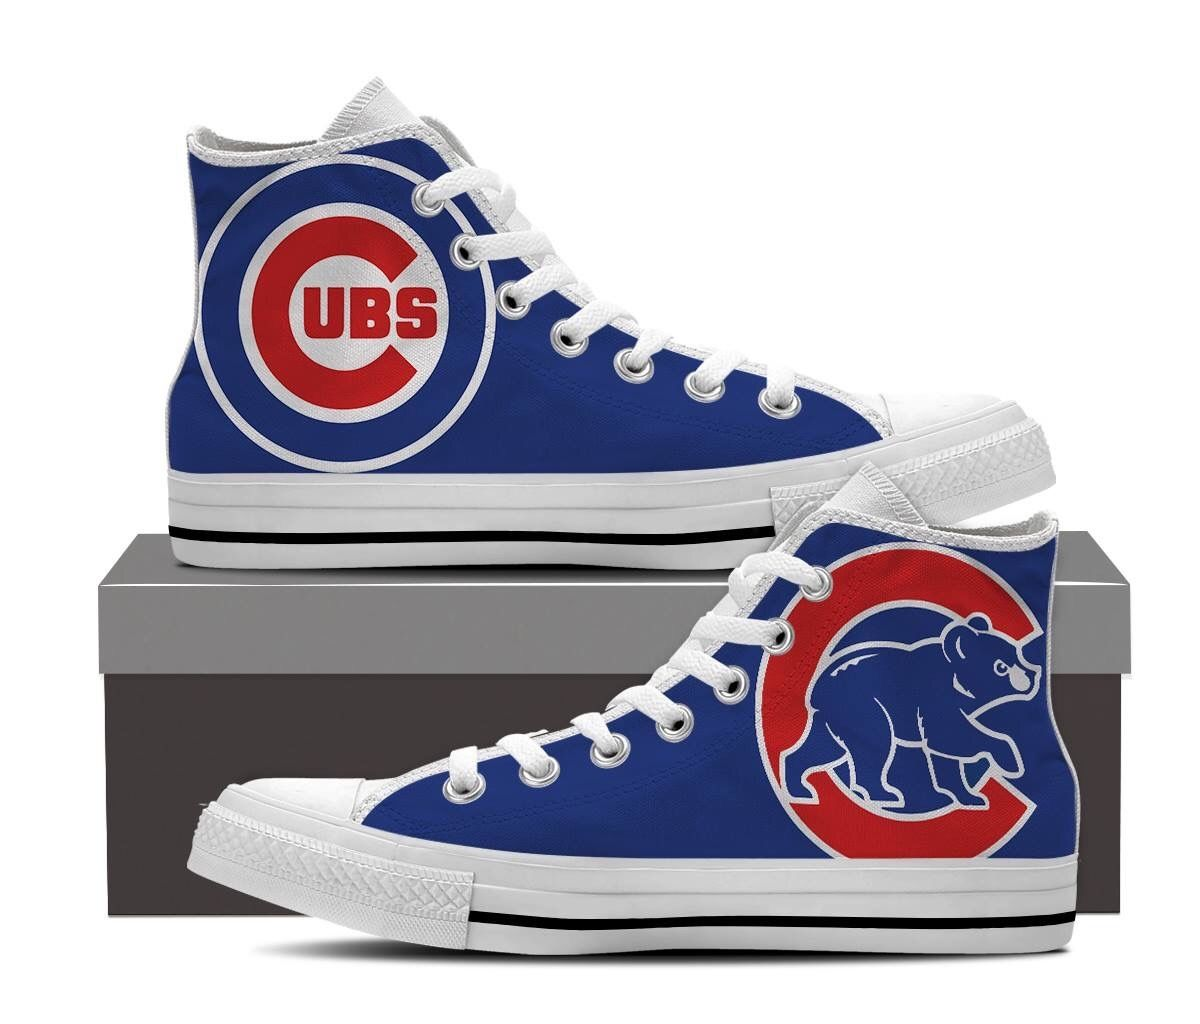 #FlytheW Cubs Converse